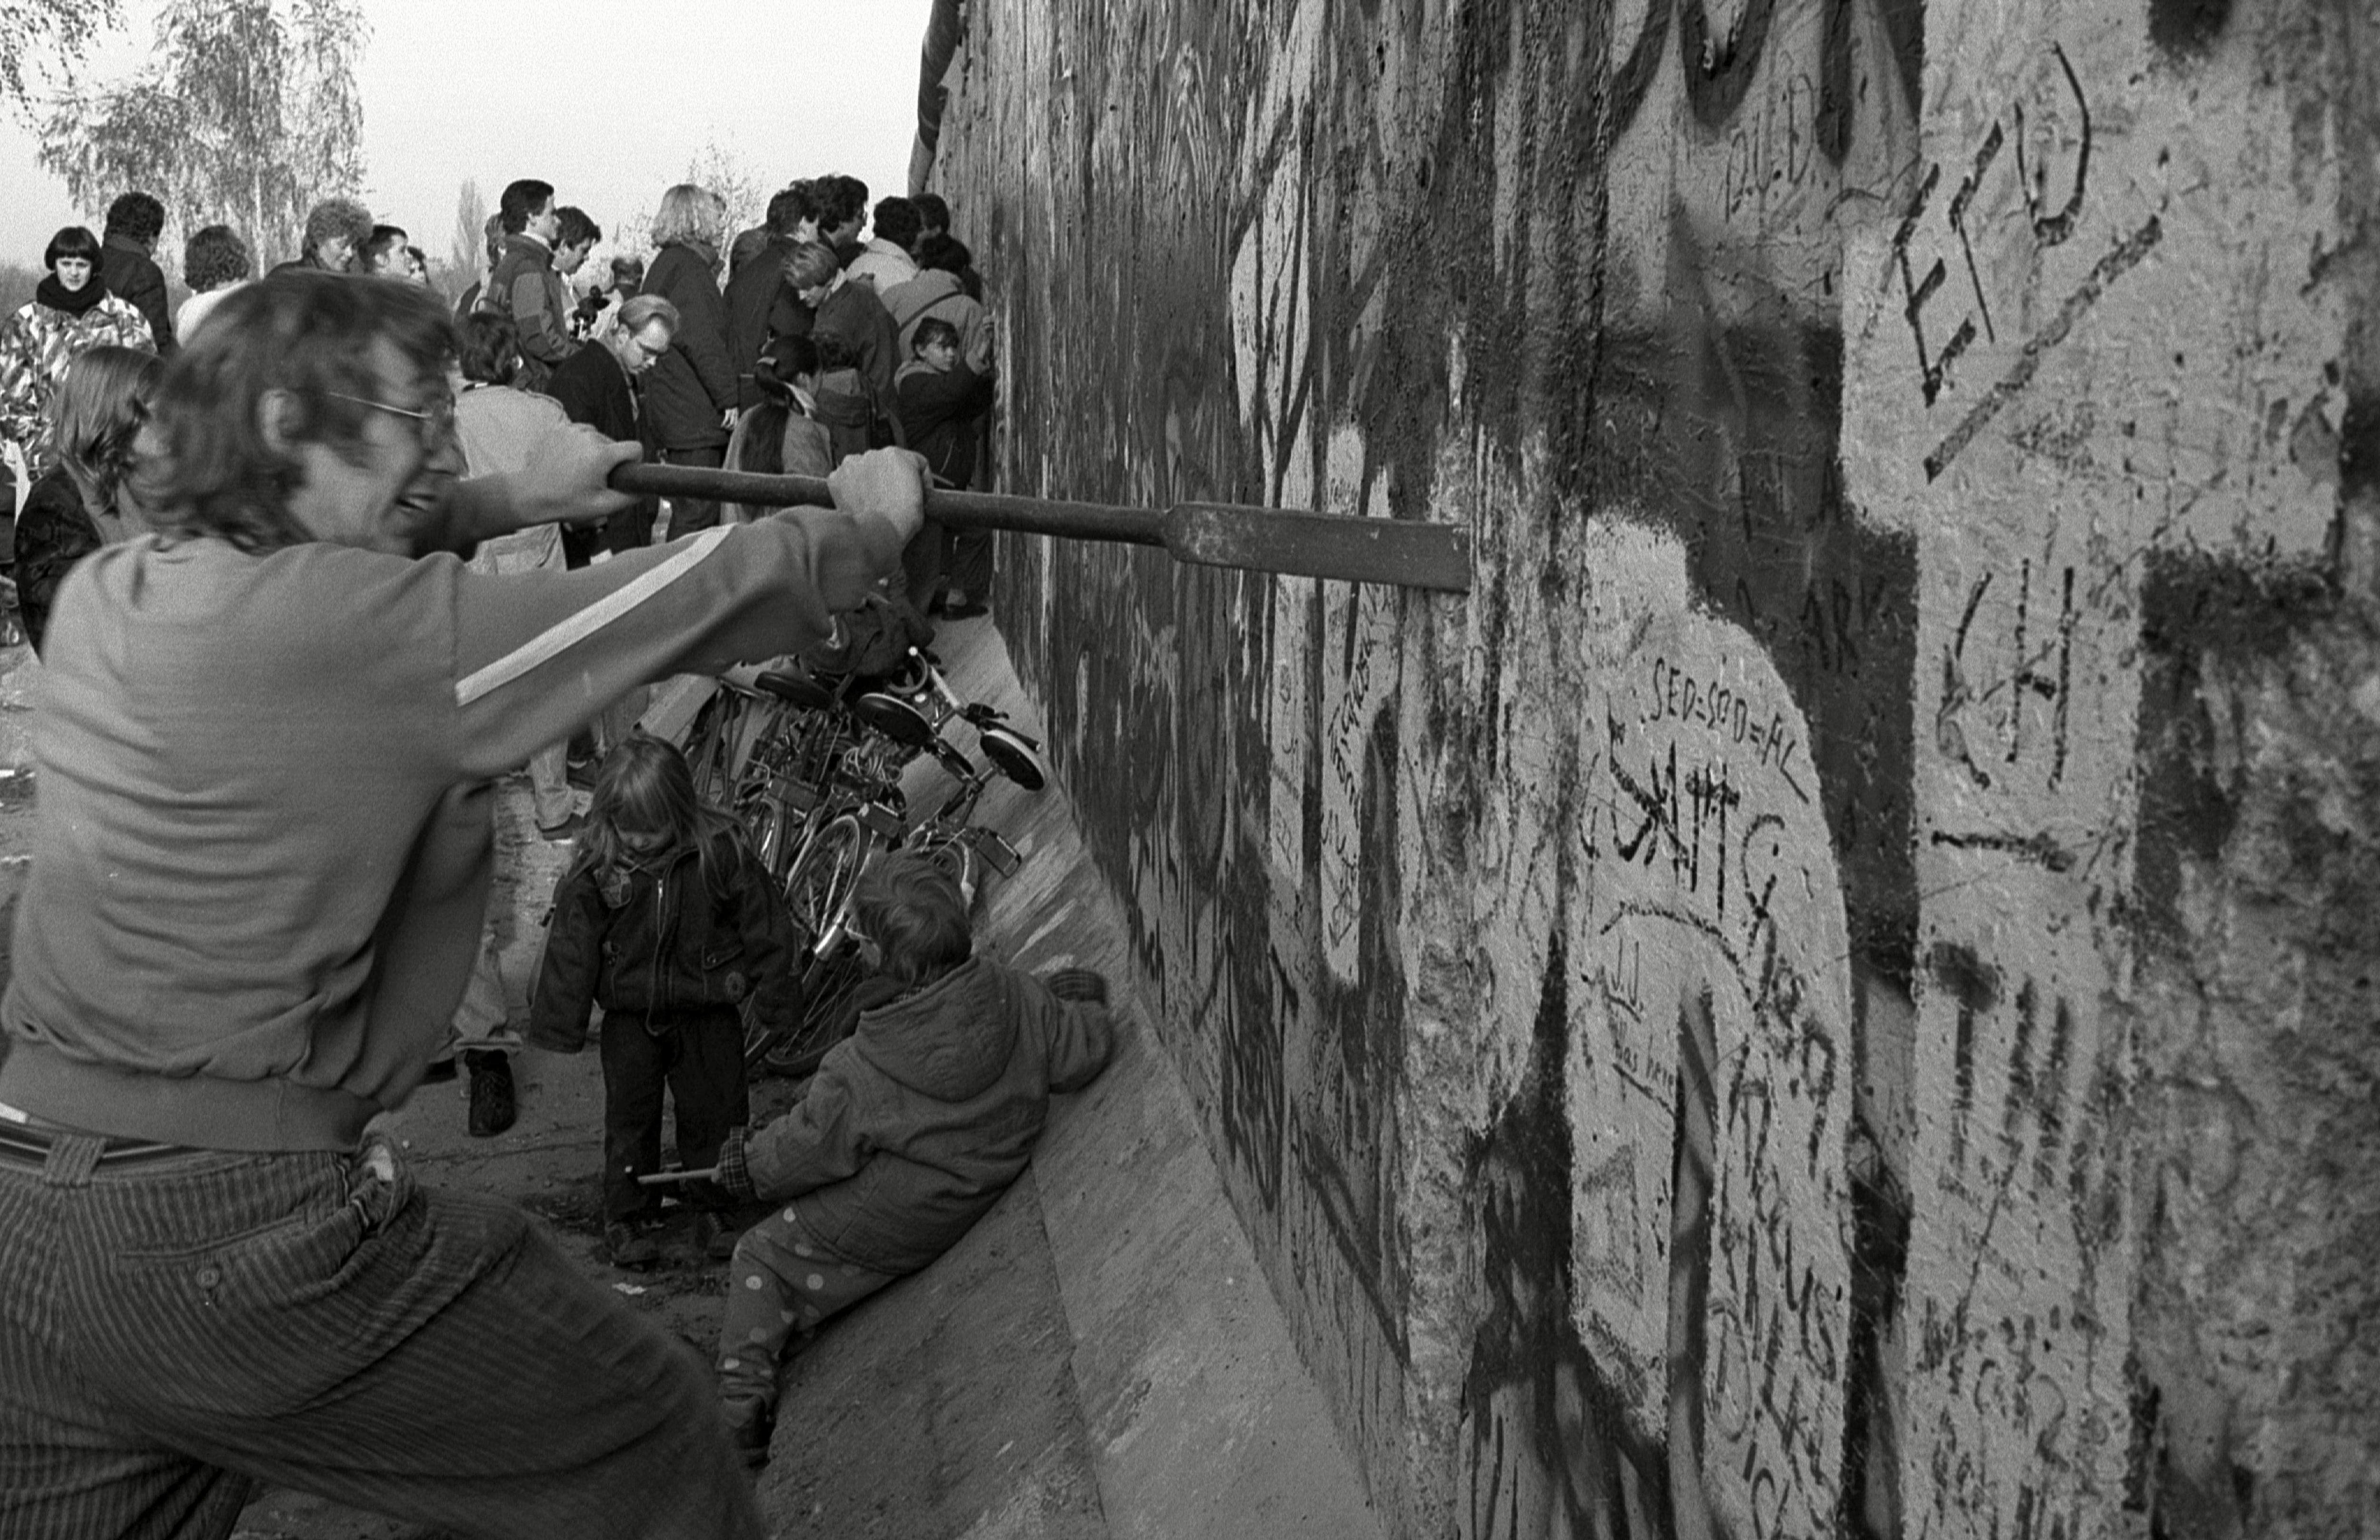 Mandatory Credit: Photo by Jochen Tack/imageBROKER/Shutterstock (4693796a) Fall of the Berlin Wall, Berlin, Germany, Europe VARIOUS